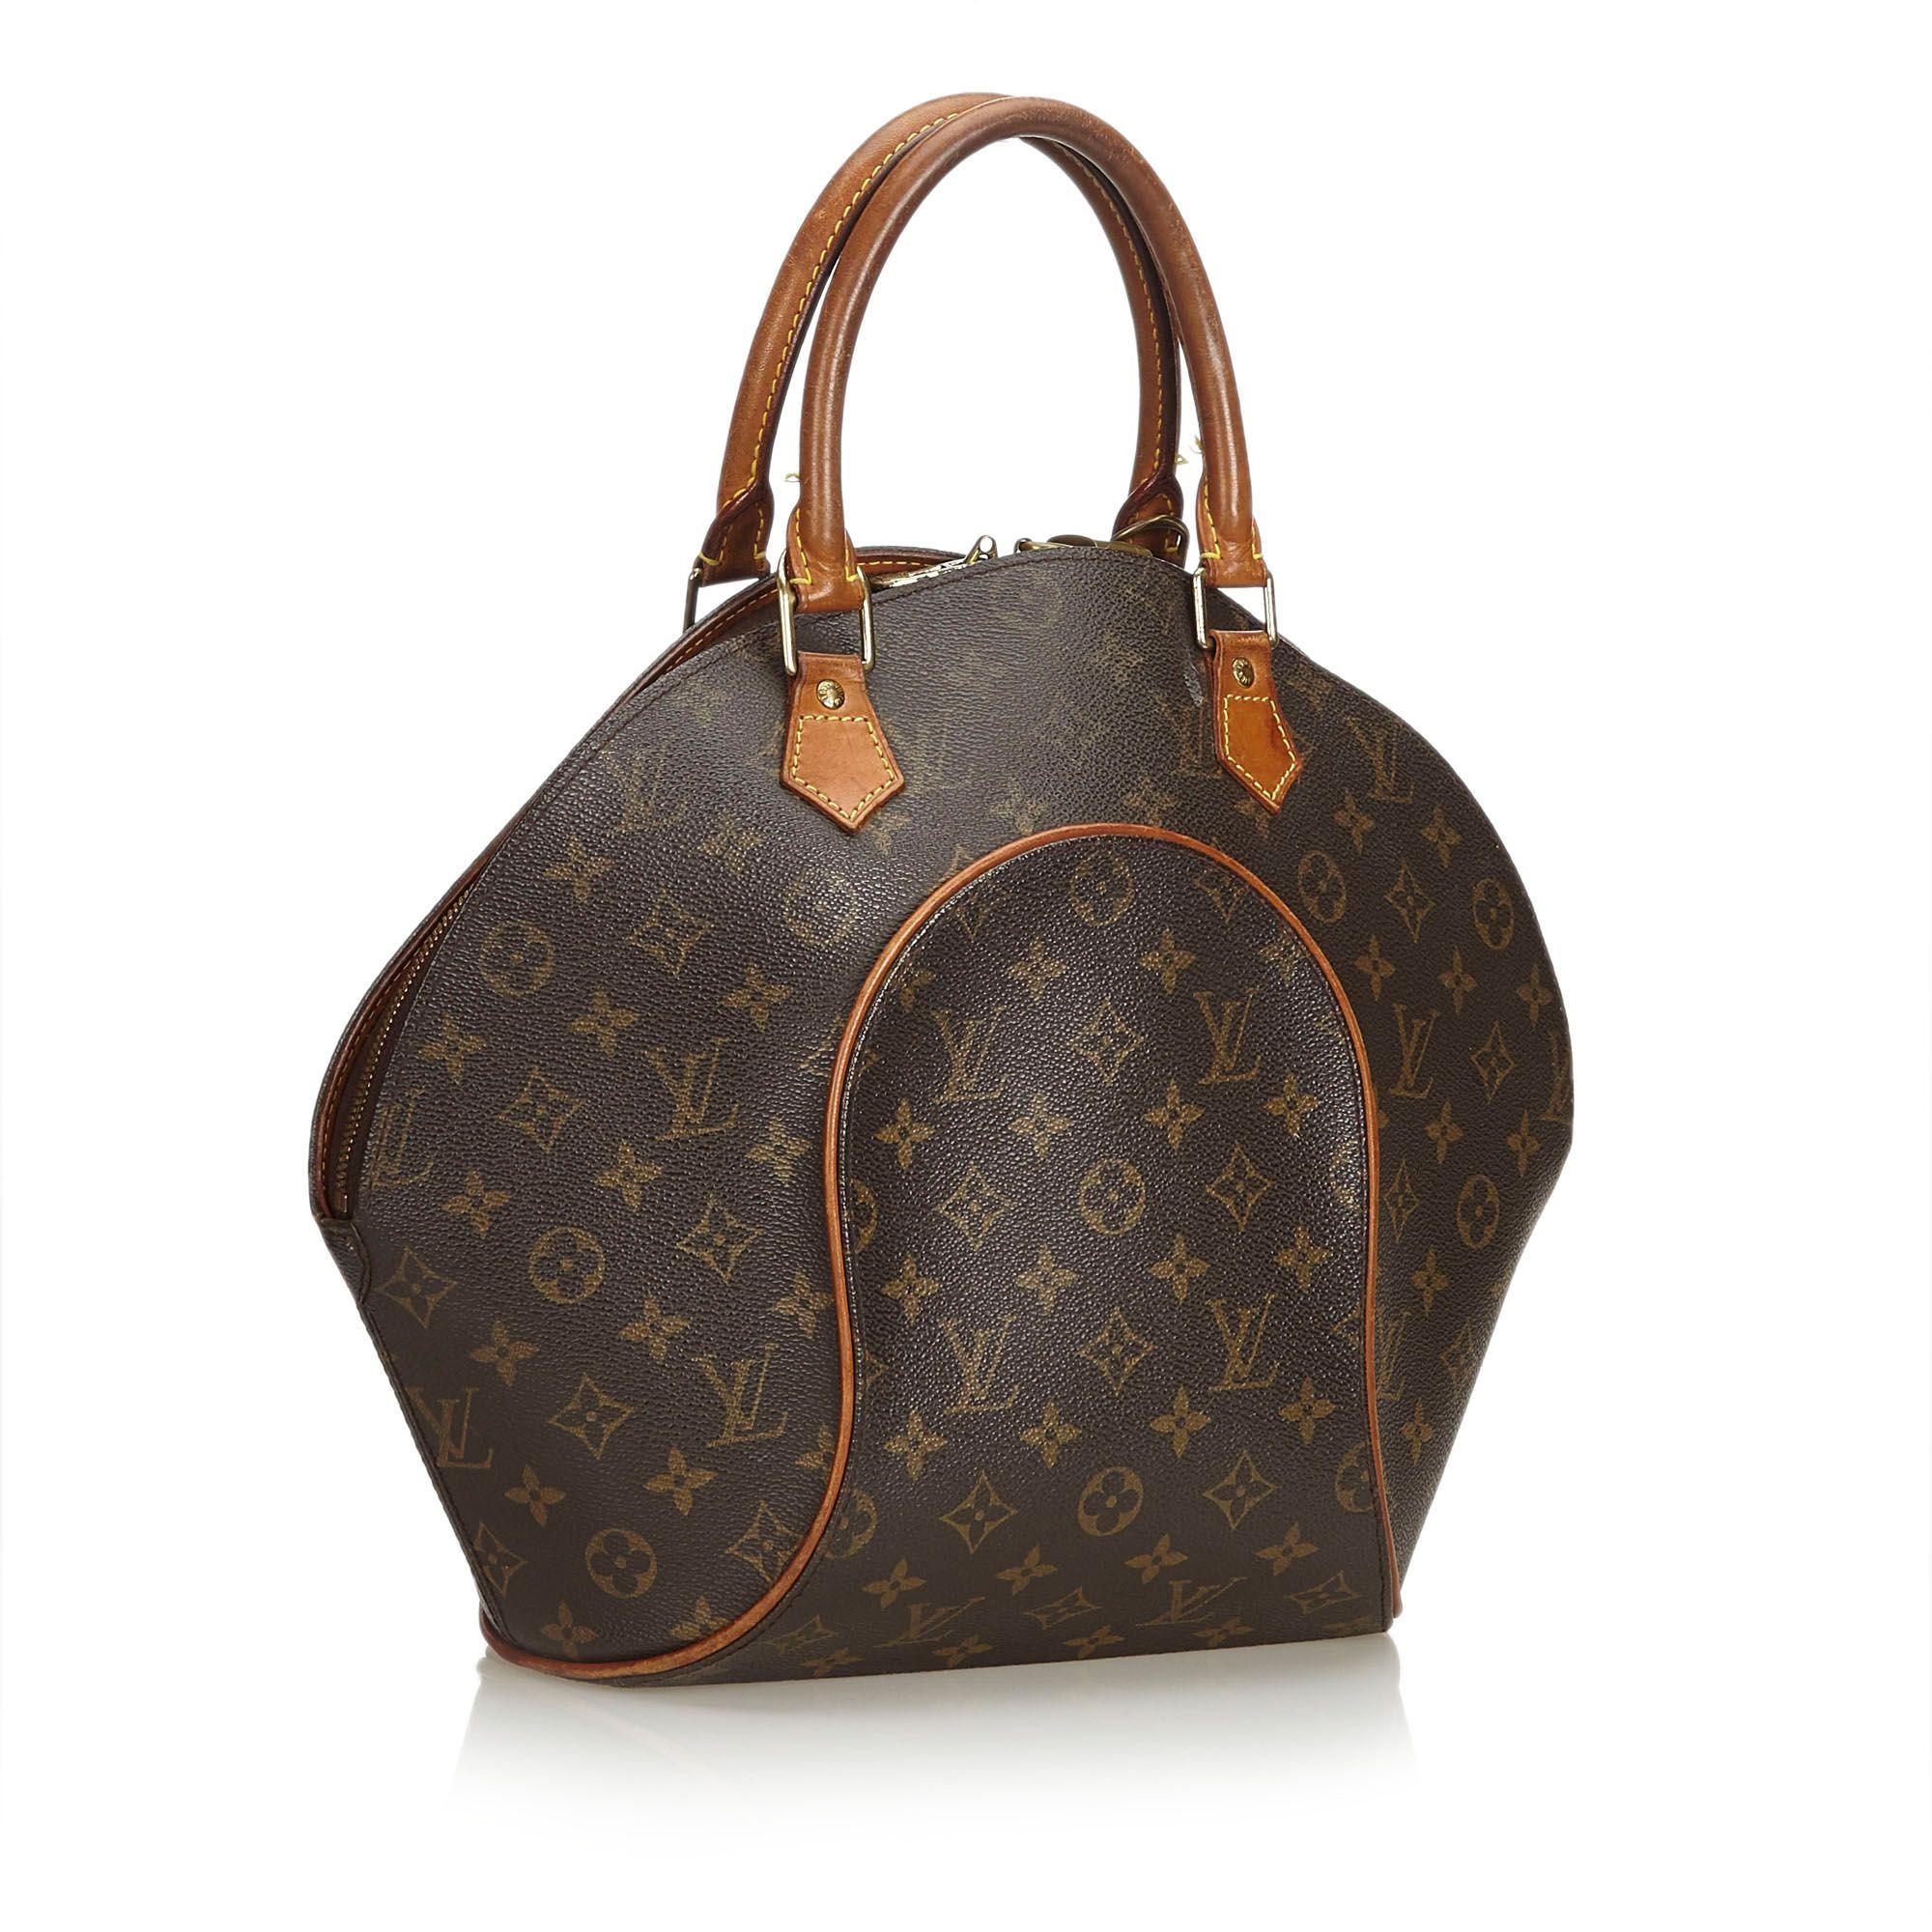 Vintage Louis Vuitton Monogram Ellipse MM Brown